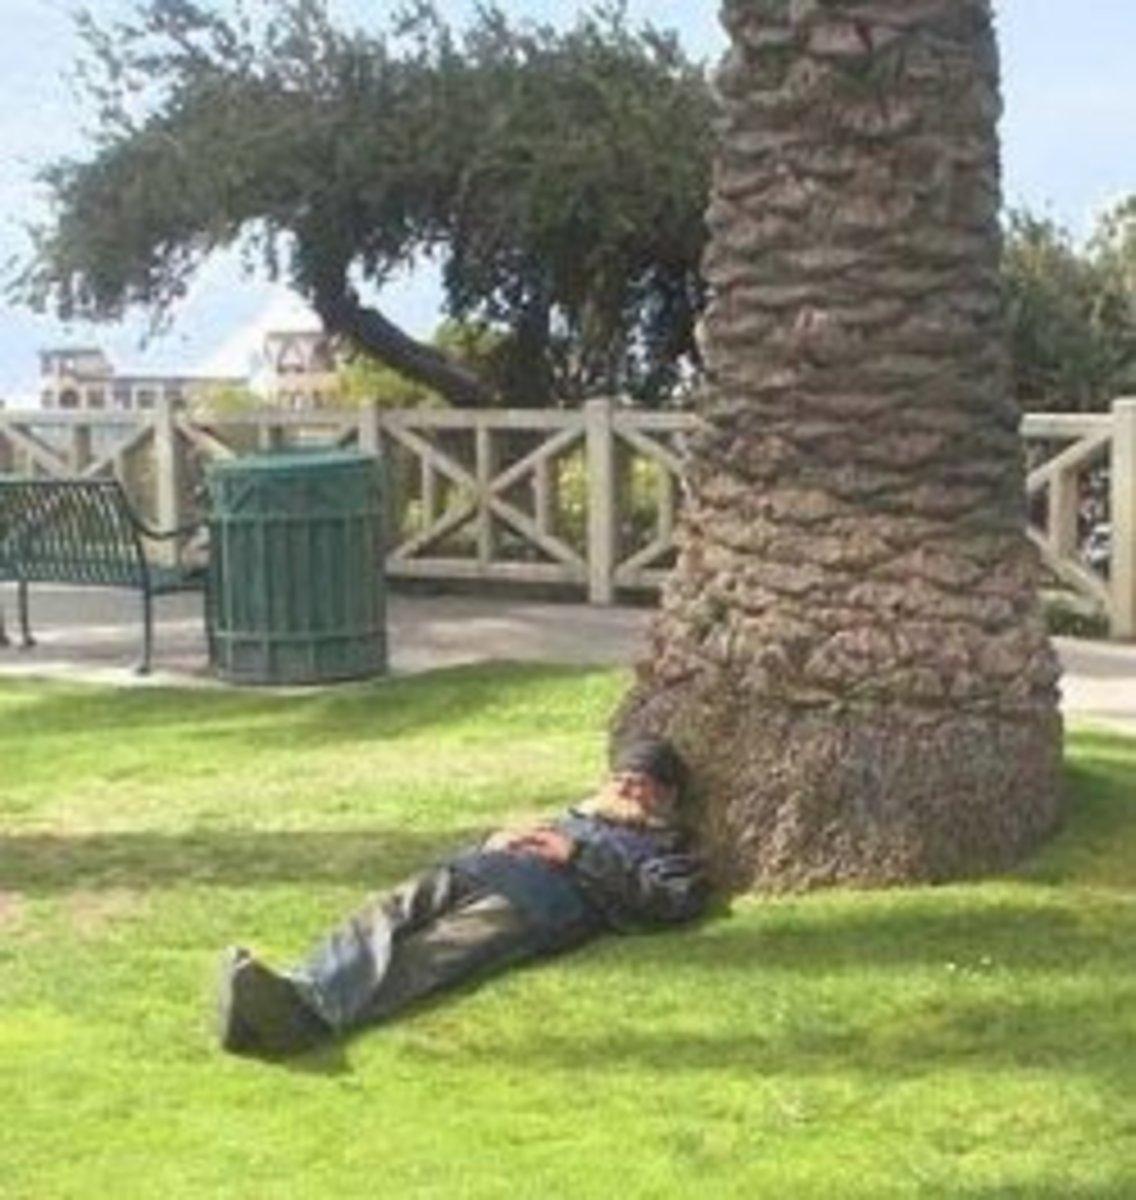 Homeless man sleeping under a palm tree in Santa Monica